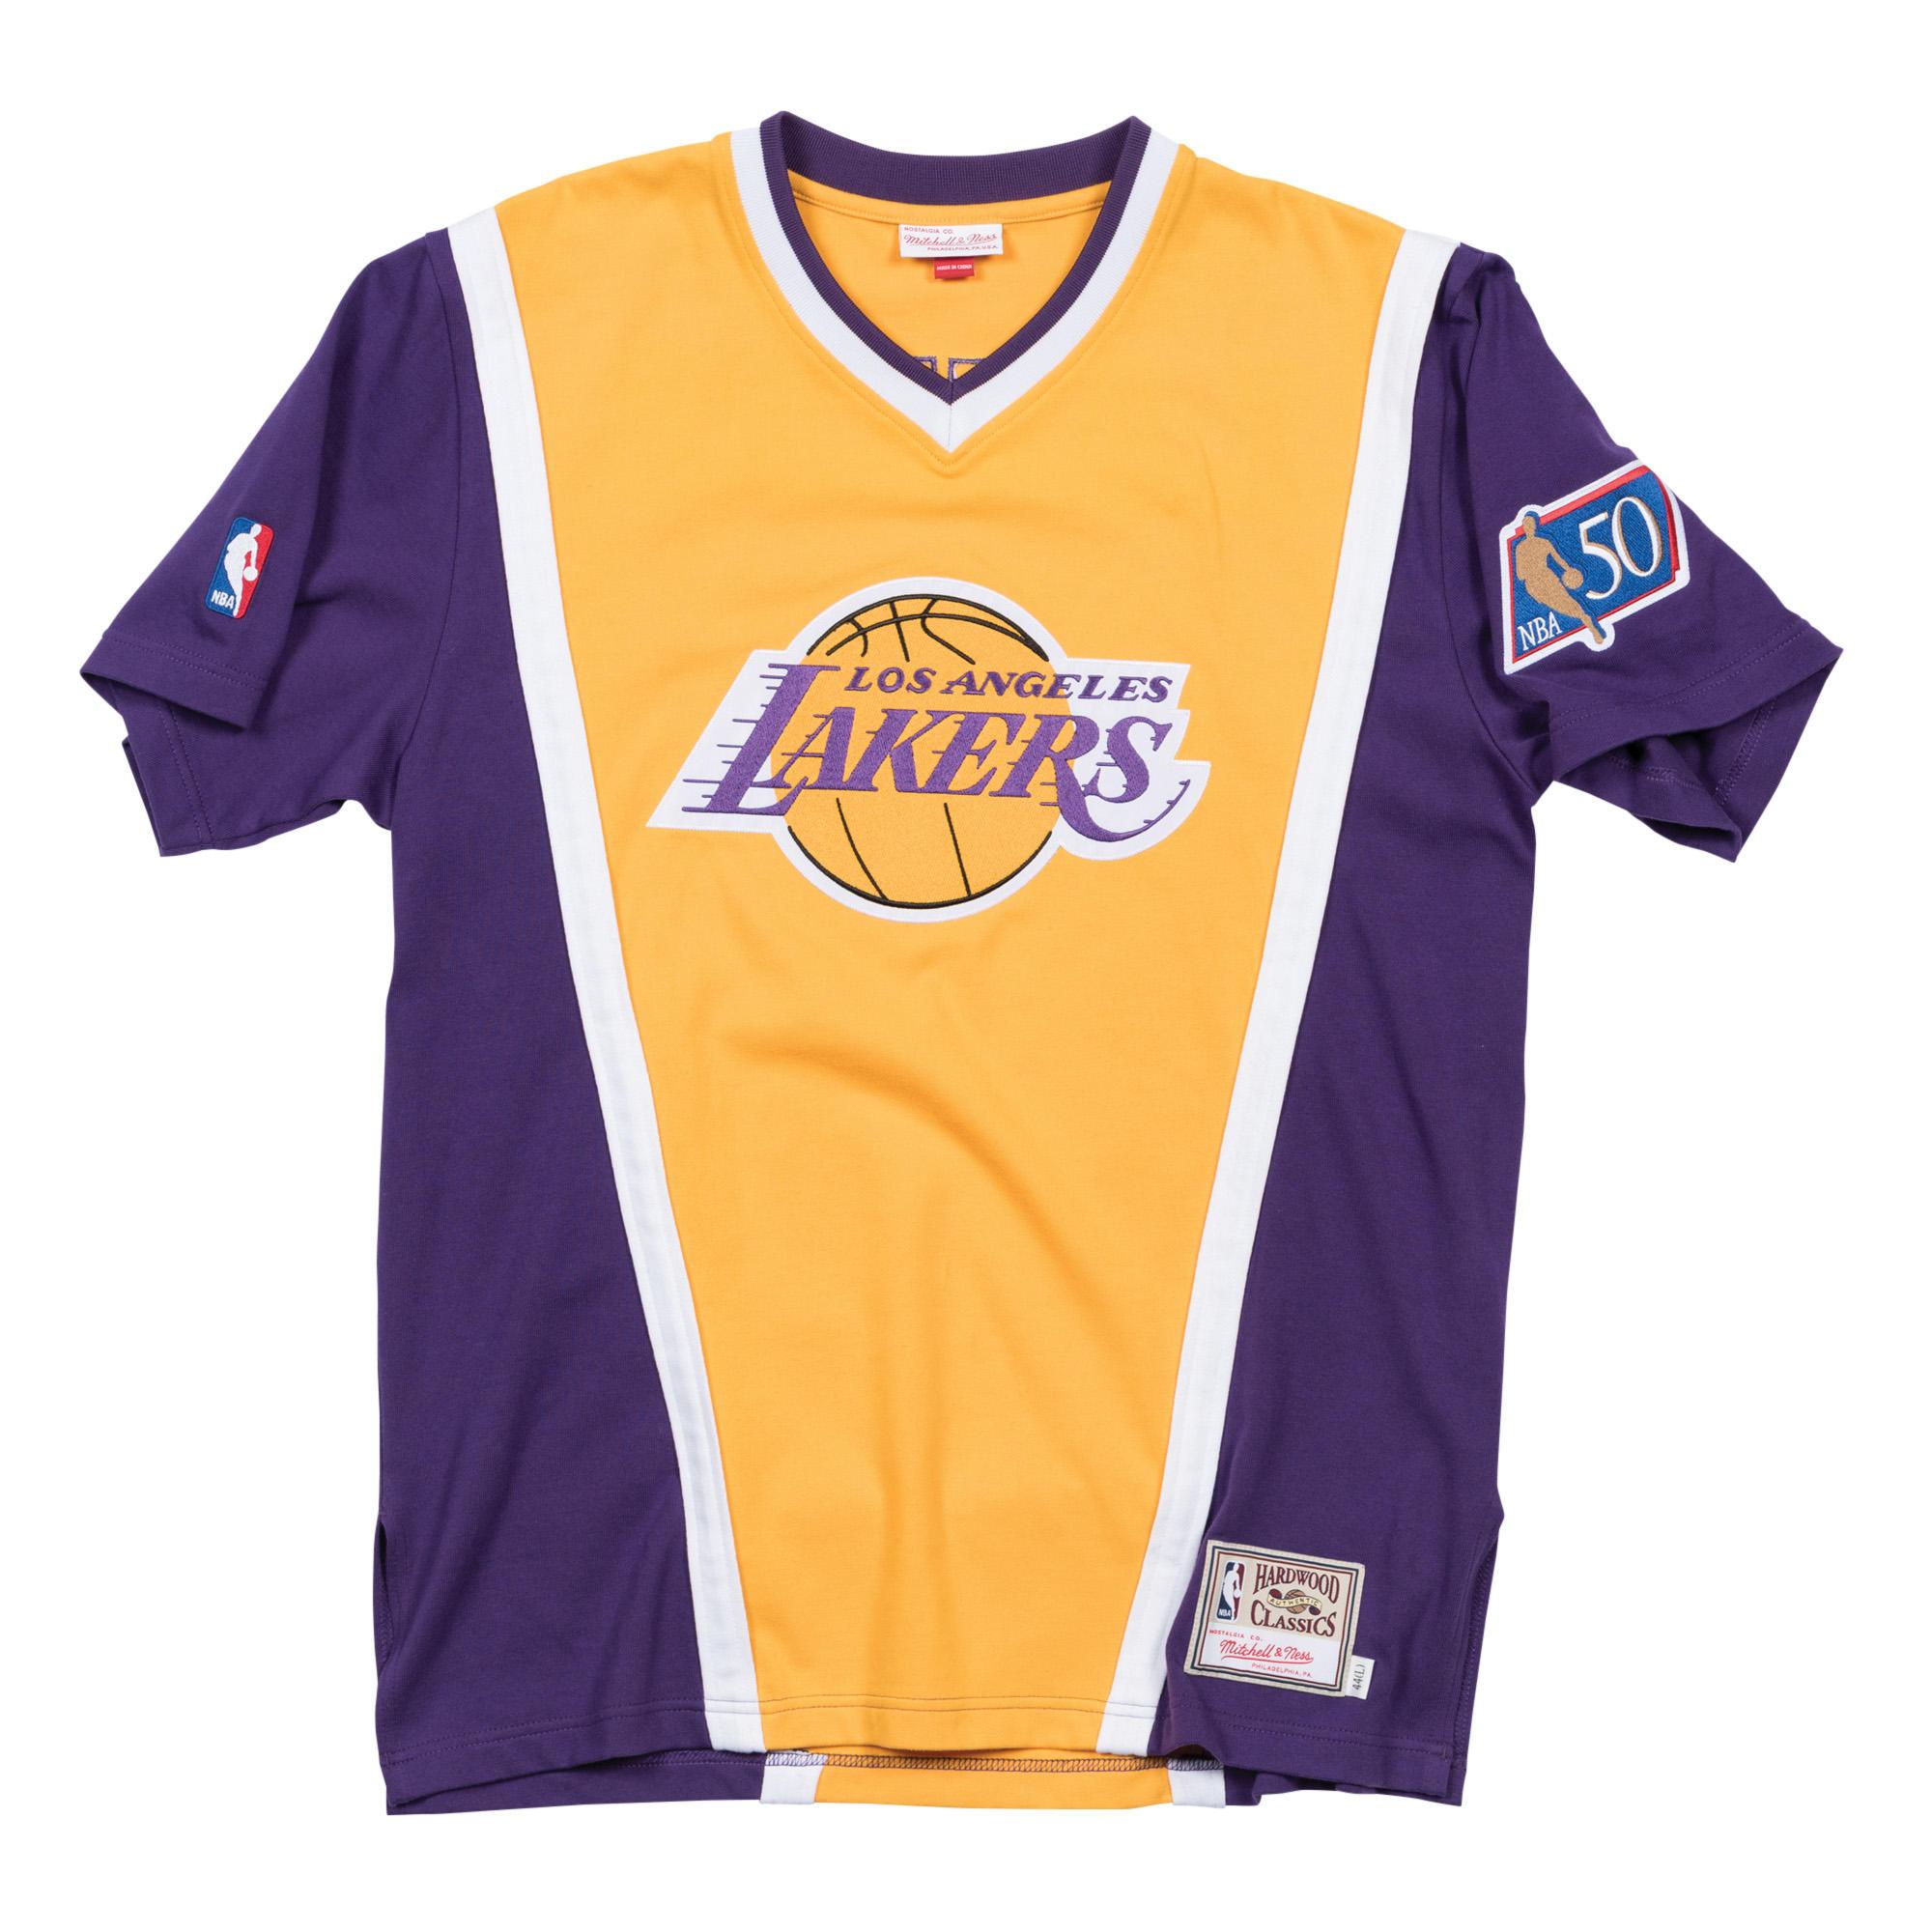 Mitchell Ness Nostalgia Co Los Angeles Lakers 1996 97